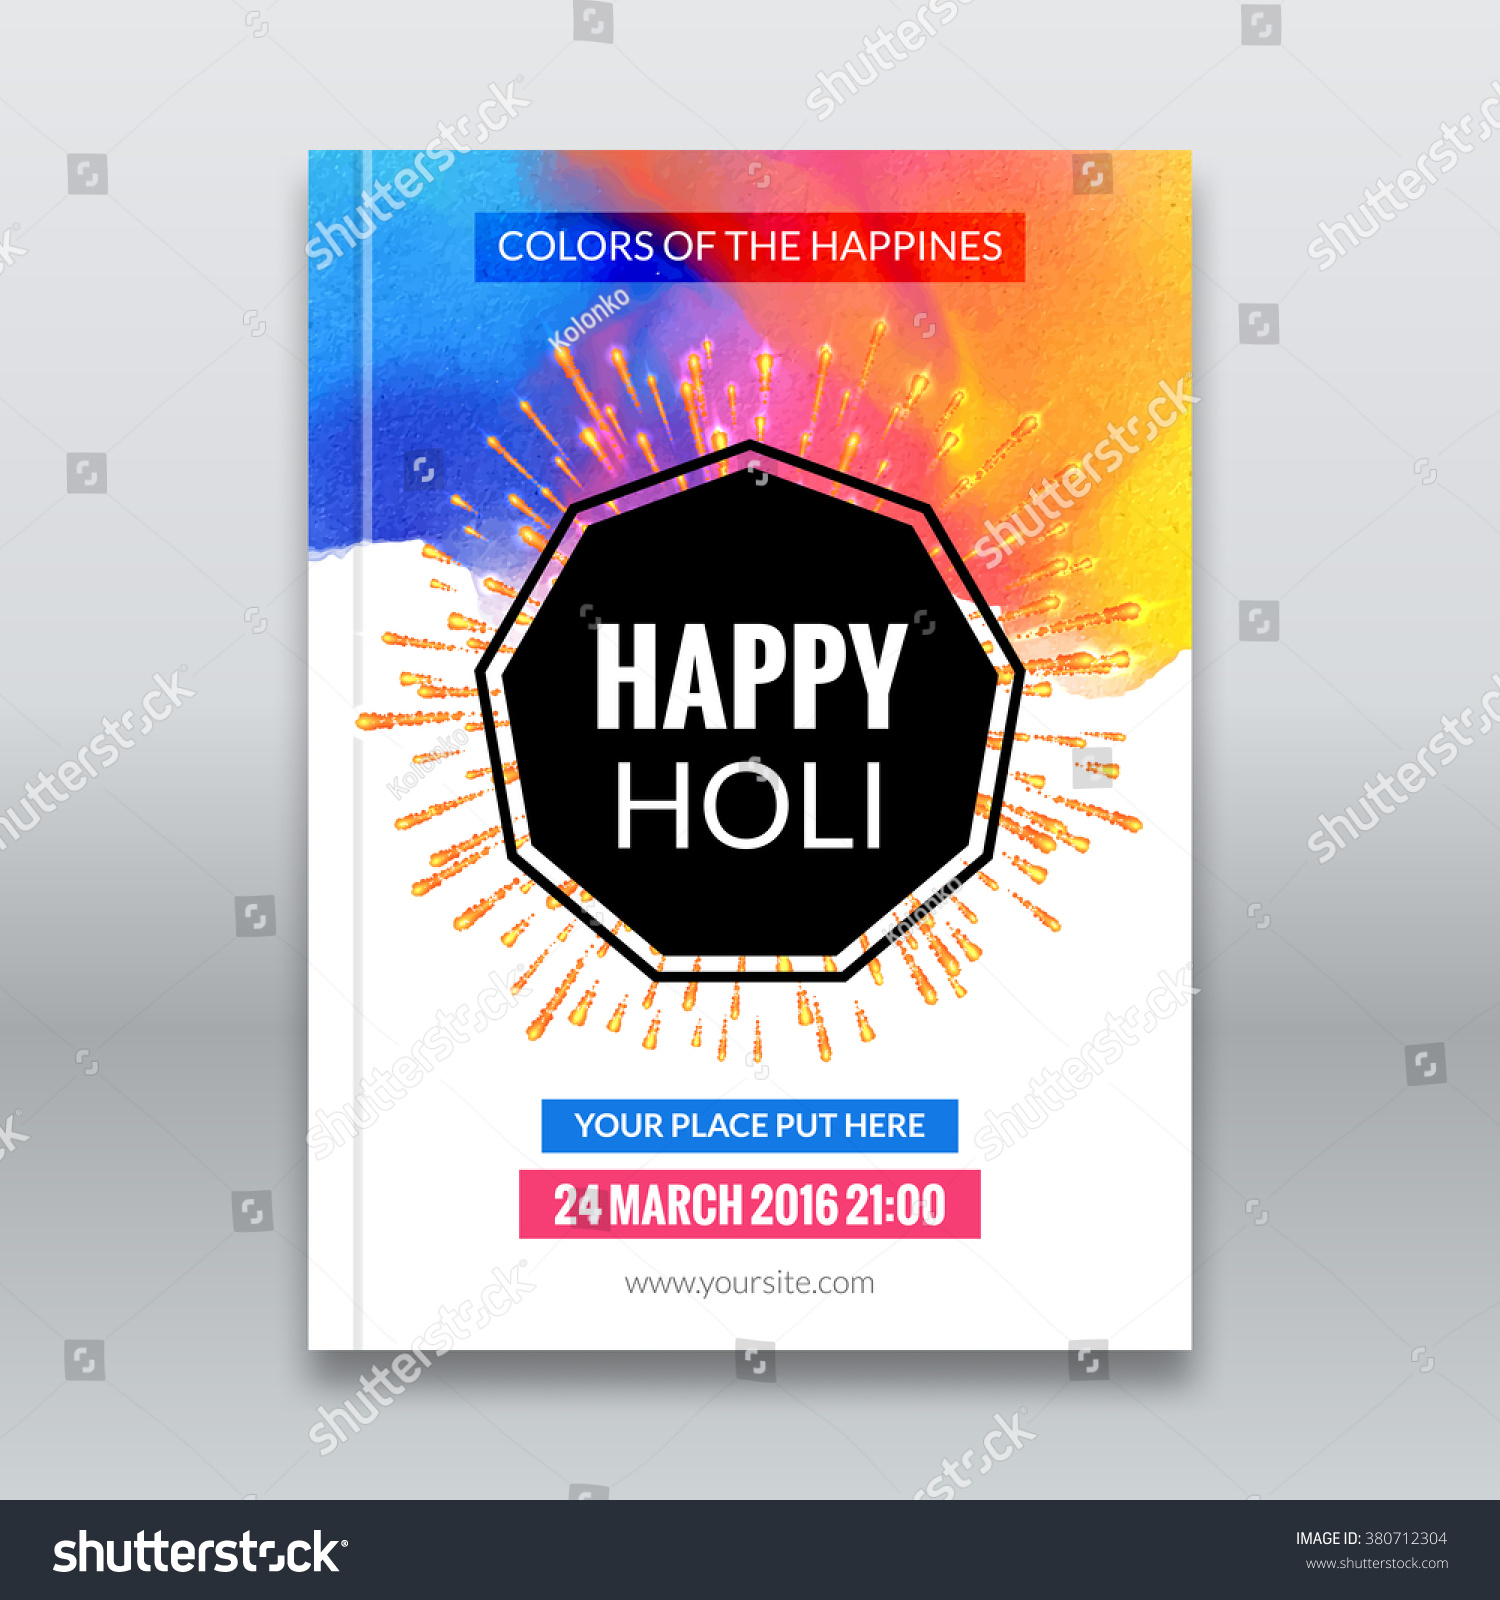 holi festival poster template flyer brochure stock vector template for flyer brochure or invitation vector illustration design